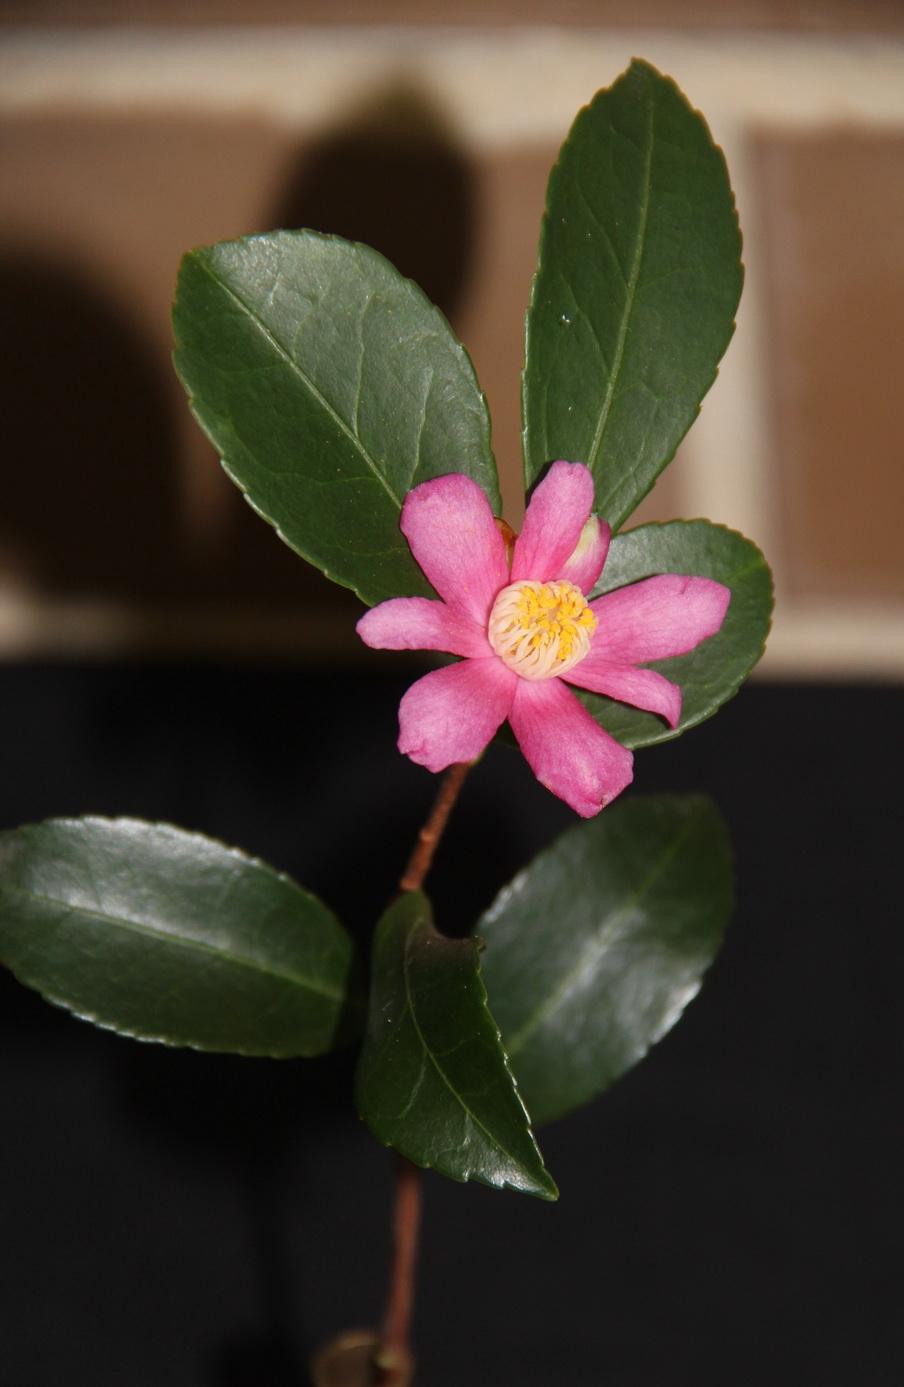 Sp. Puniceiflora